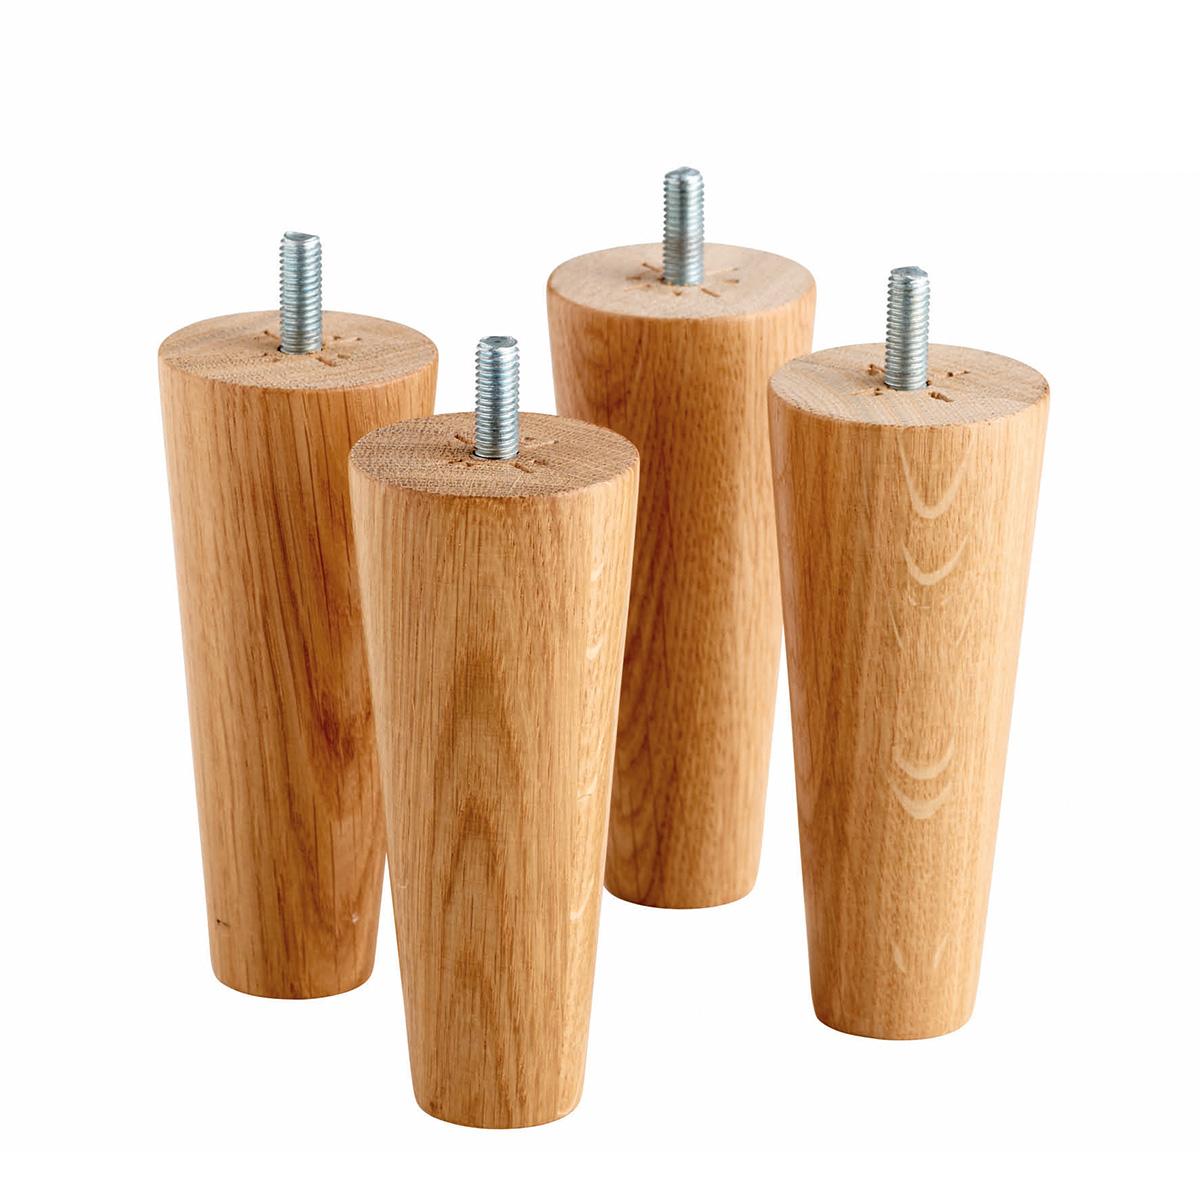 Køb Tempur ben 19cm rund træ Design Eg – 4 stk